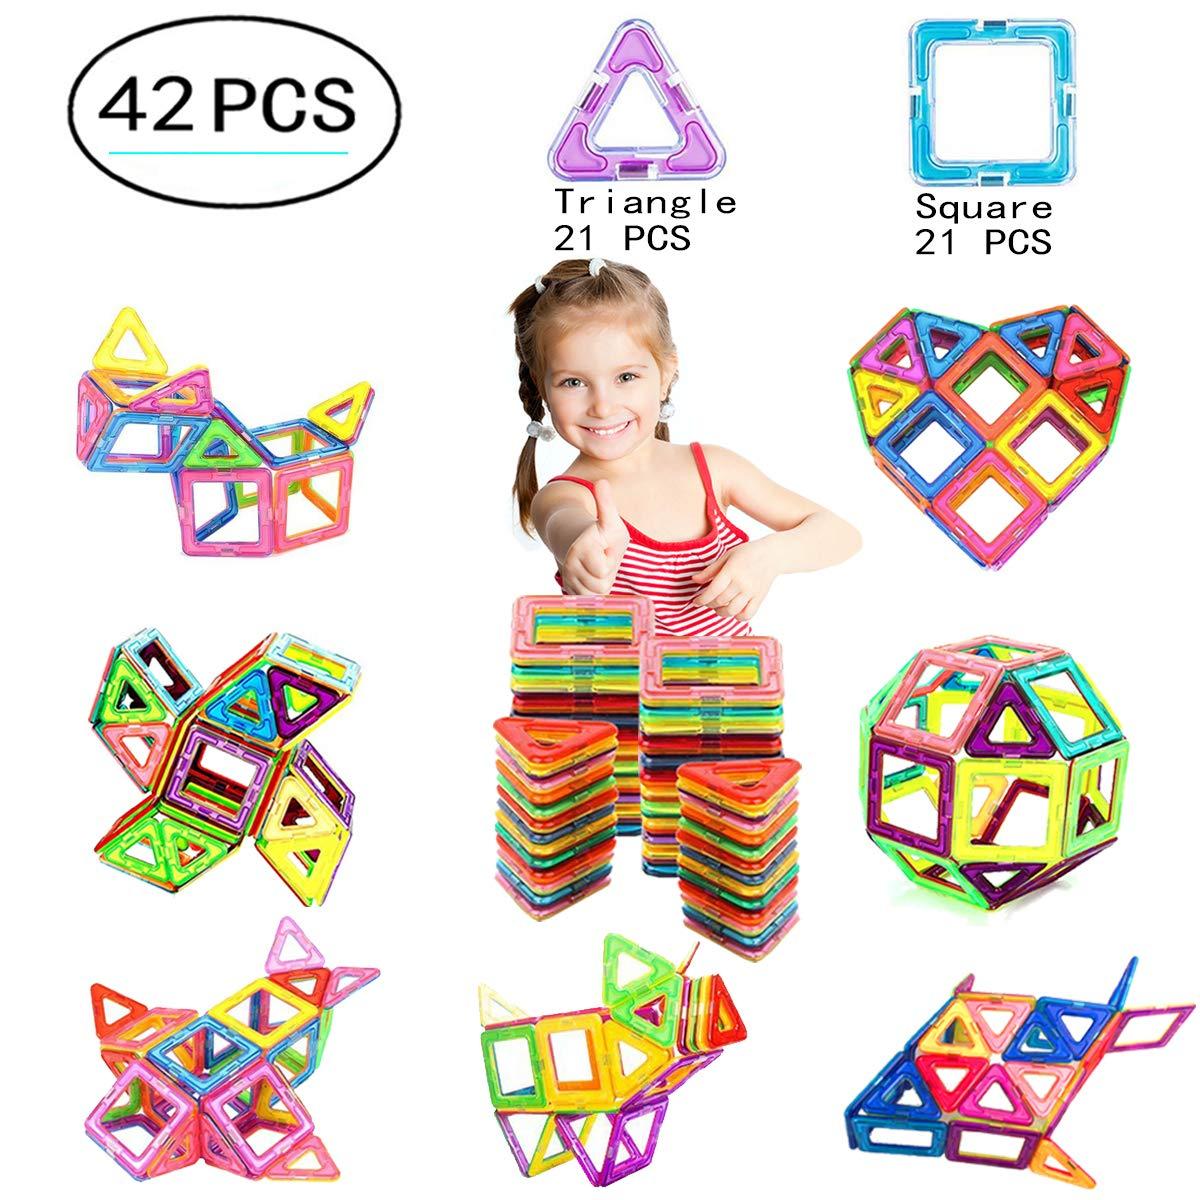 Ehome Magnetic Blocks, 42 PCS Magnetic Building Blocks with Strong Magnet, Magnetic Building Set for Kids Magnetic Tiles Educational Stacking Blocks Boys Girls Toys.